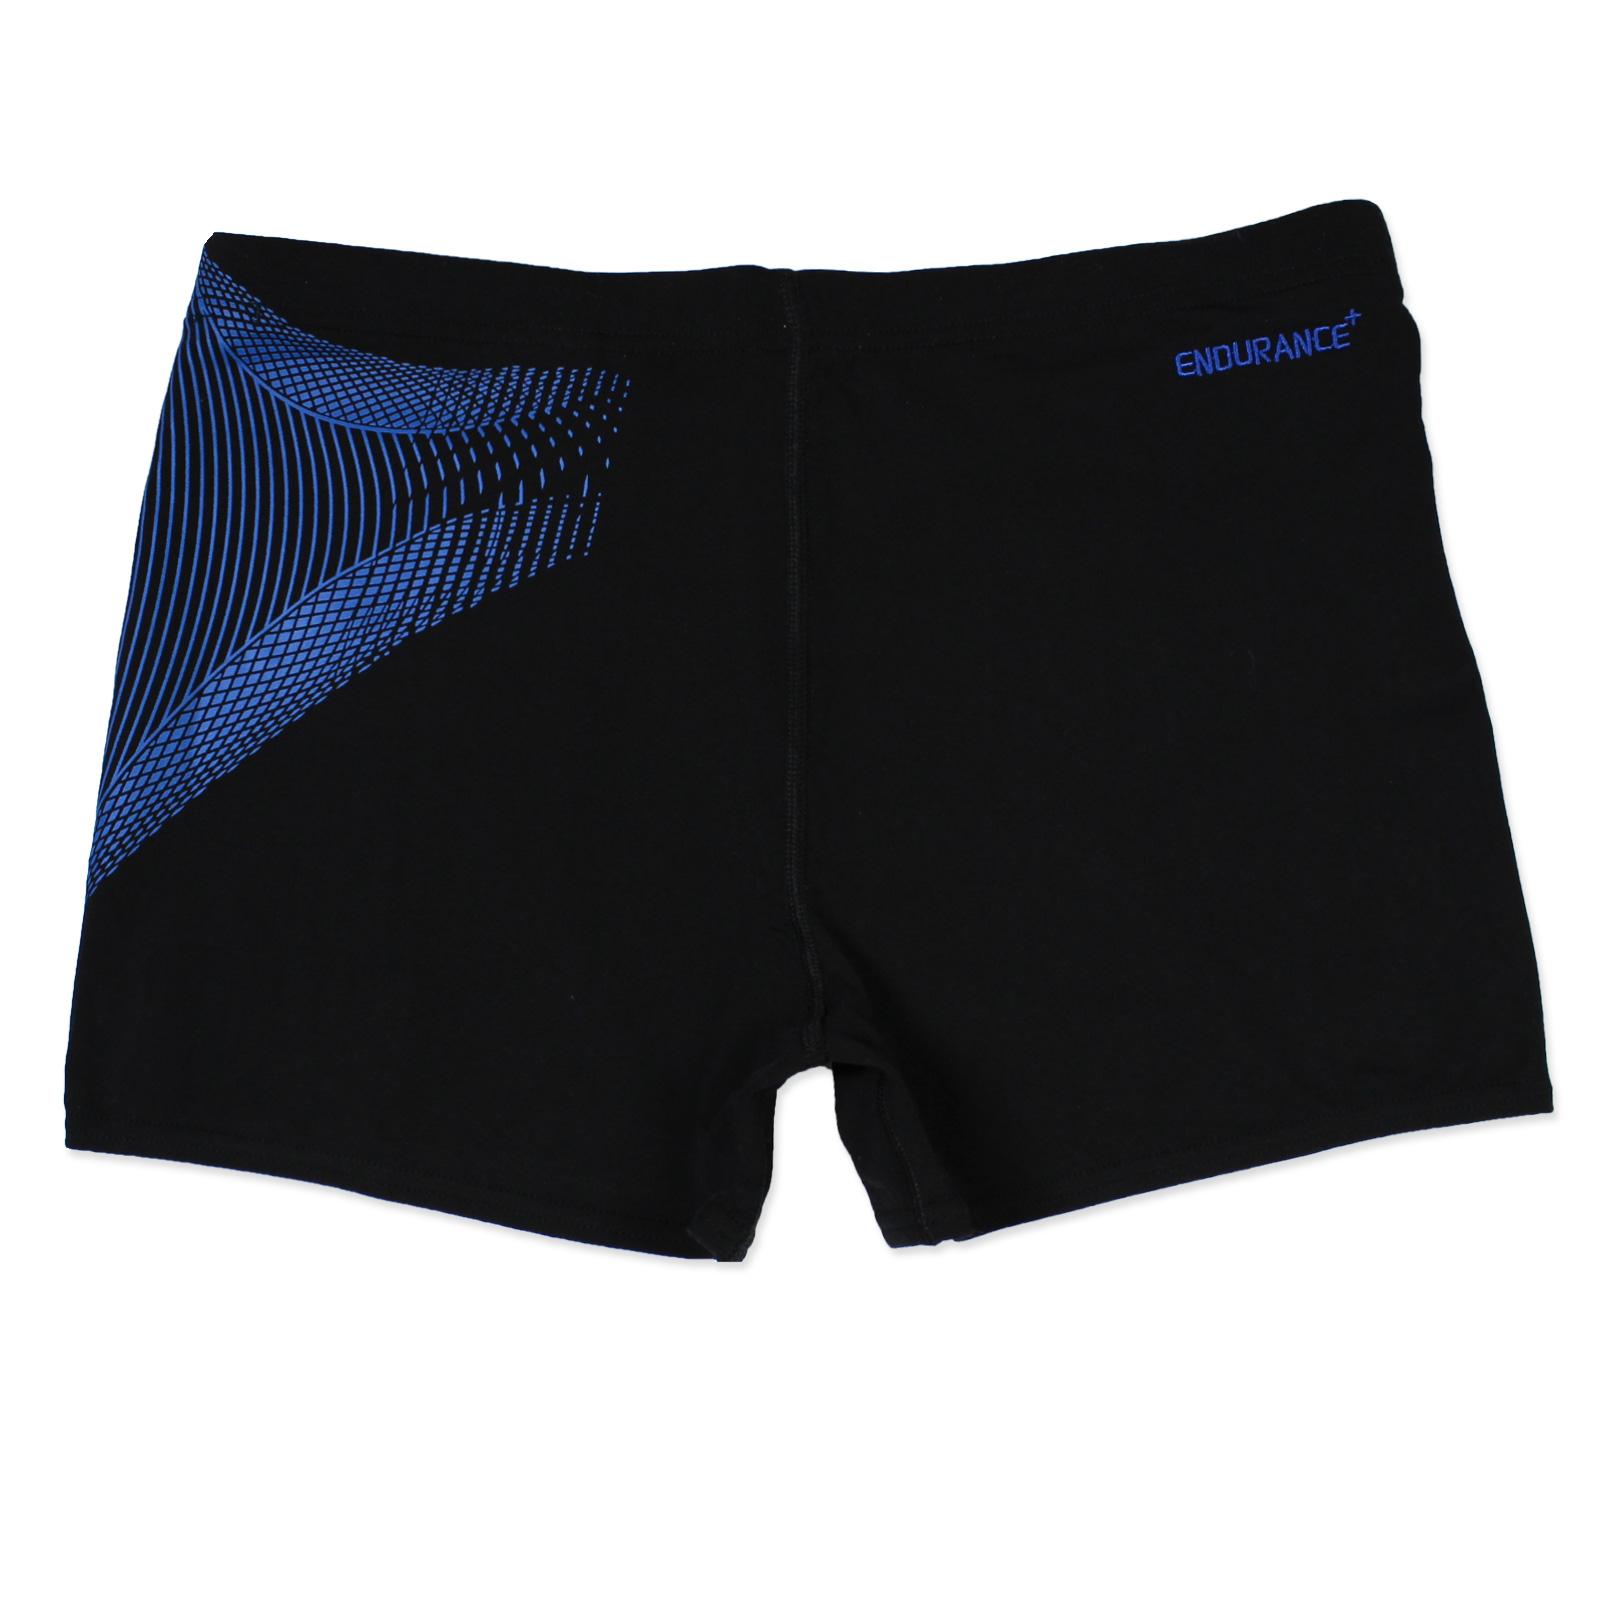 Speedo Aquashorts Herren Boxer Badehose Schwimmhose Badeshorts Schwarz Blau